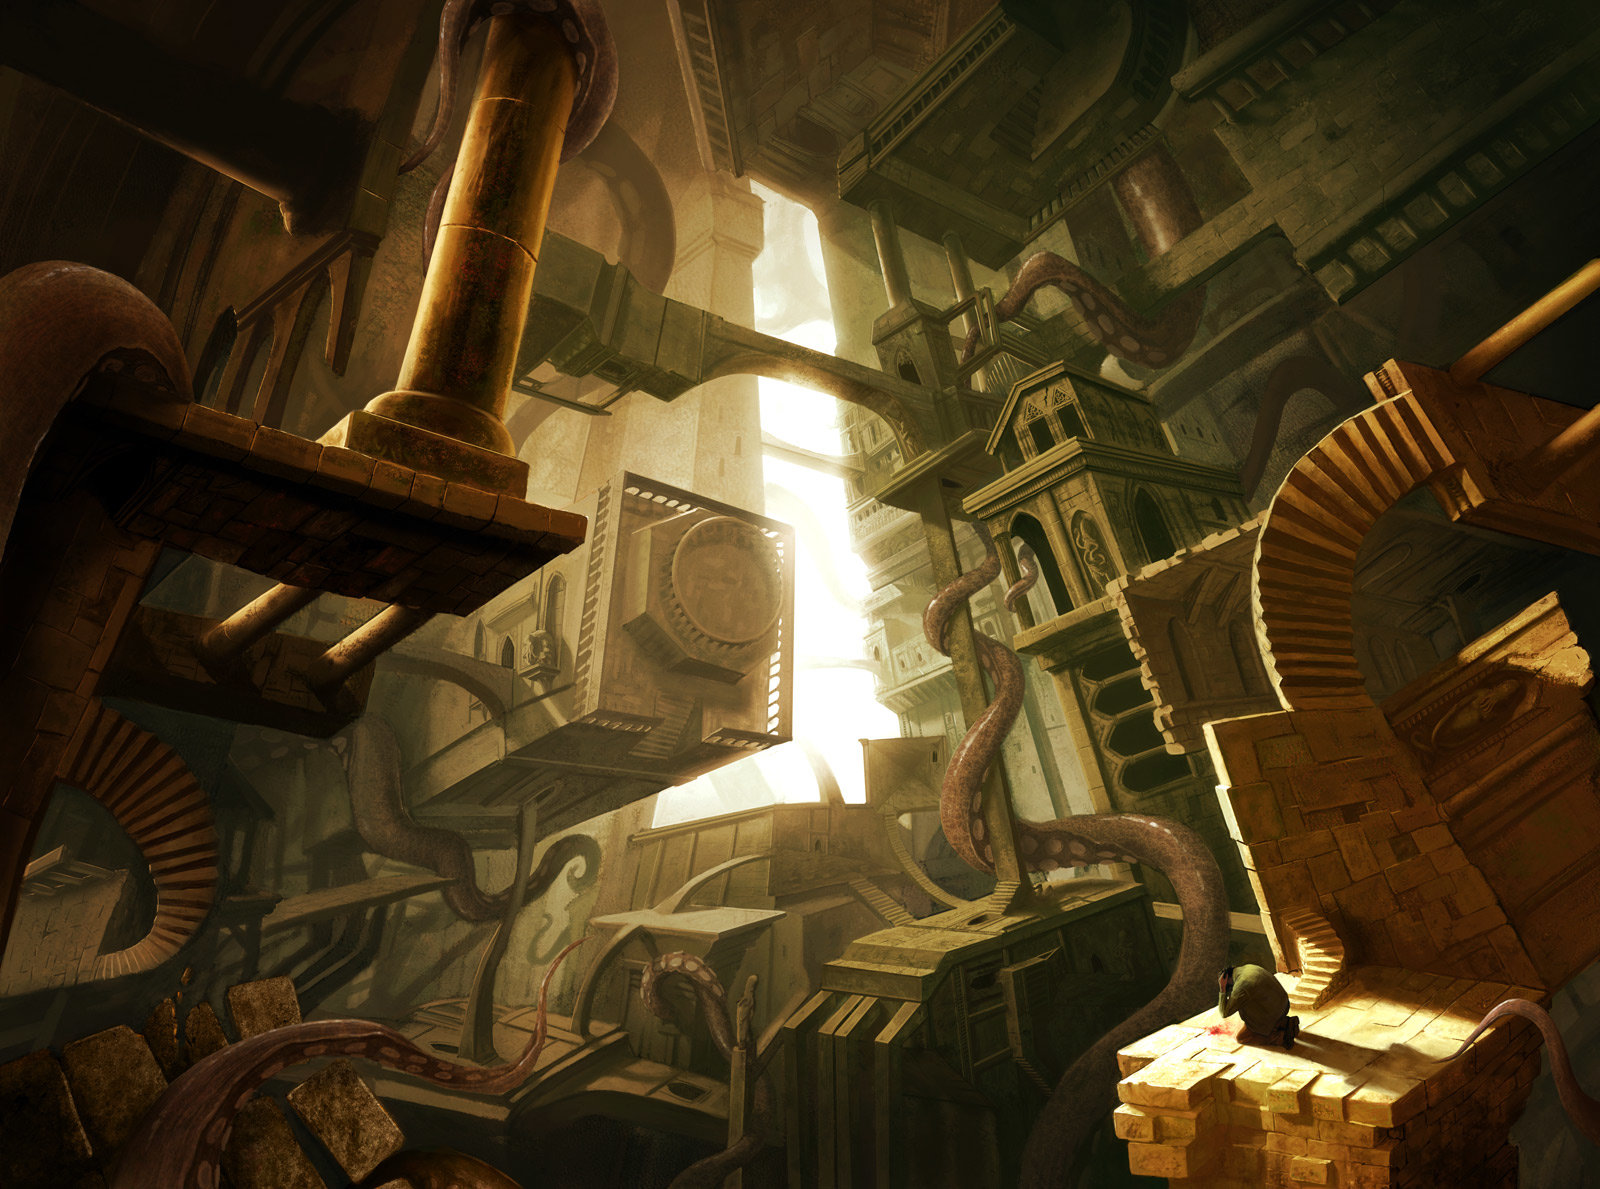 The Sci-Fi & Fantasy Art of Marc Simonetti